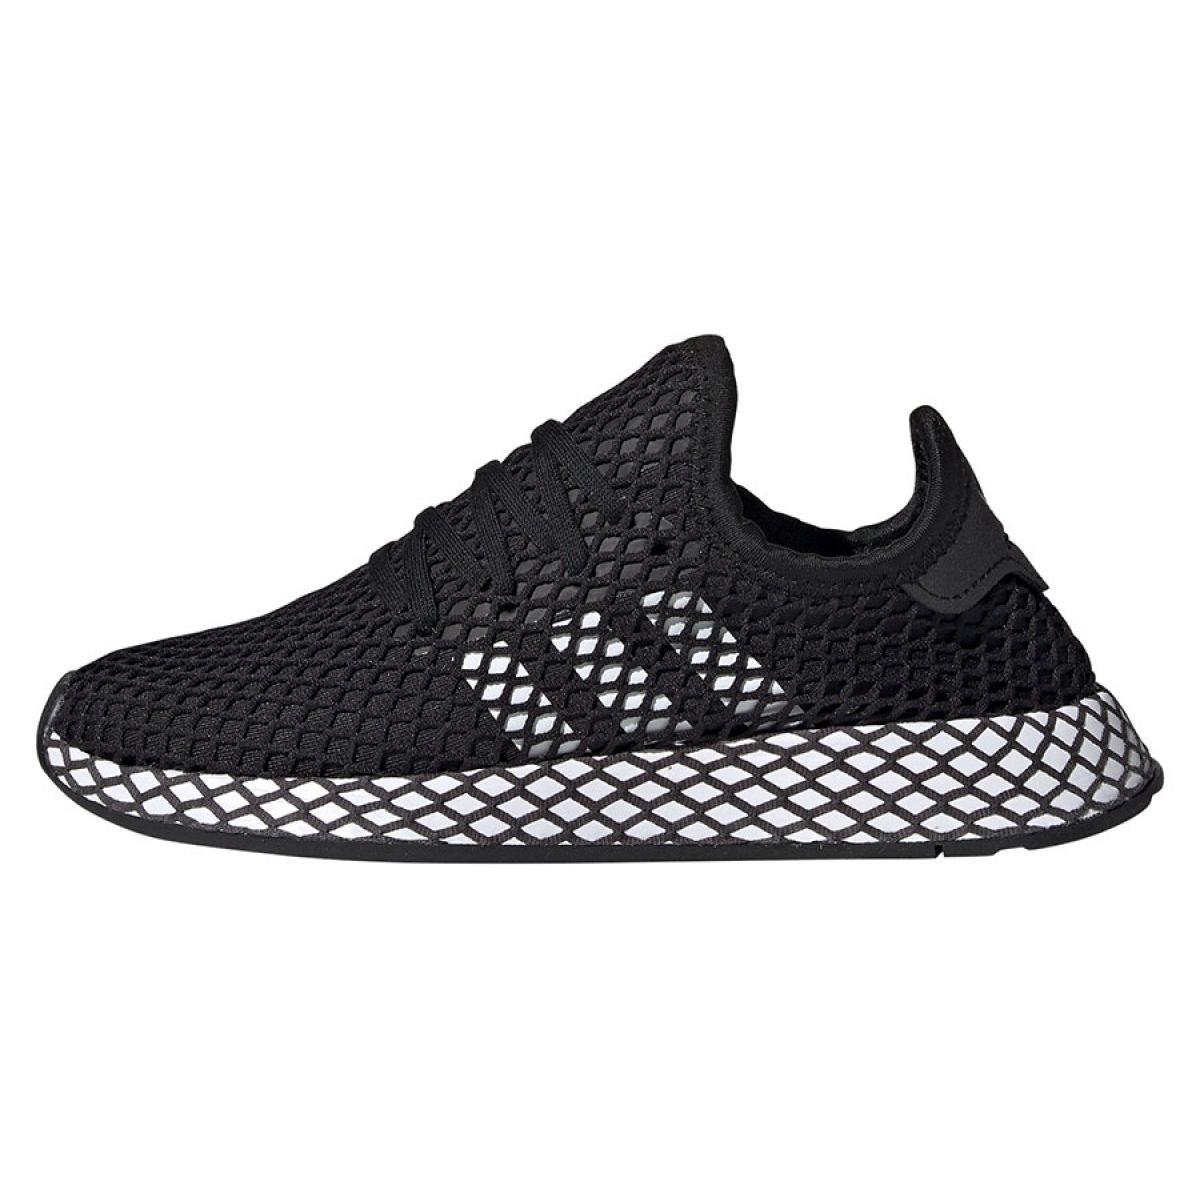 Adidas Originals Deerupt Runner Jr CG6840 shoes